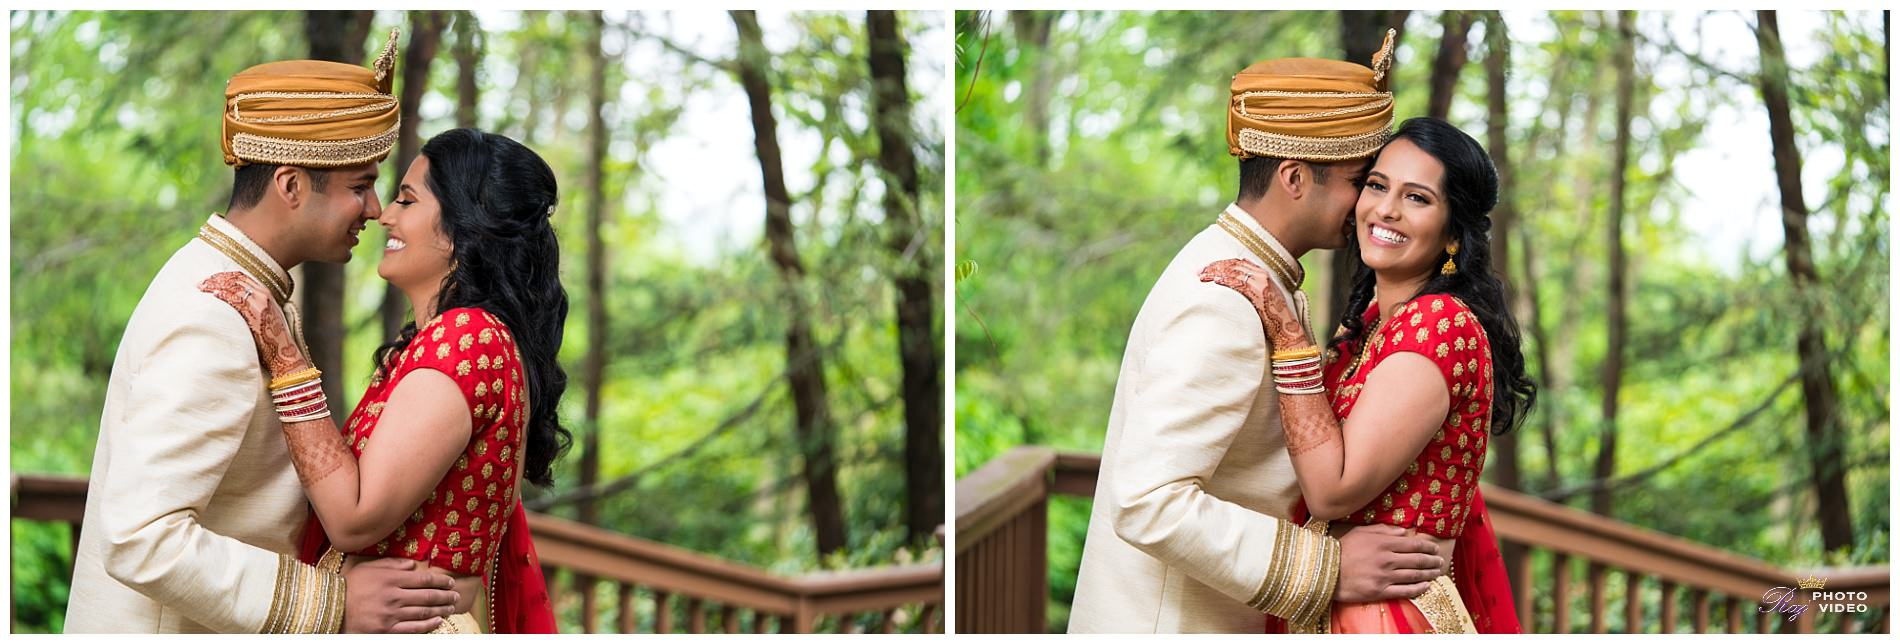 Martinsville-Gardens-NJ-Indian-Wedding-Ruchi-Vishal-9.jpg